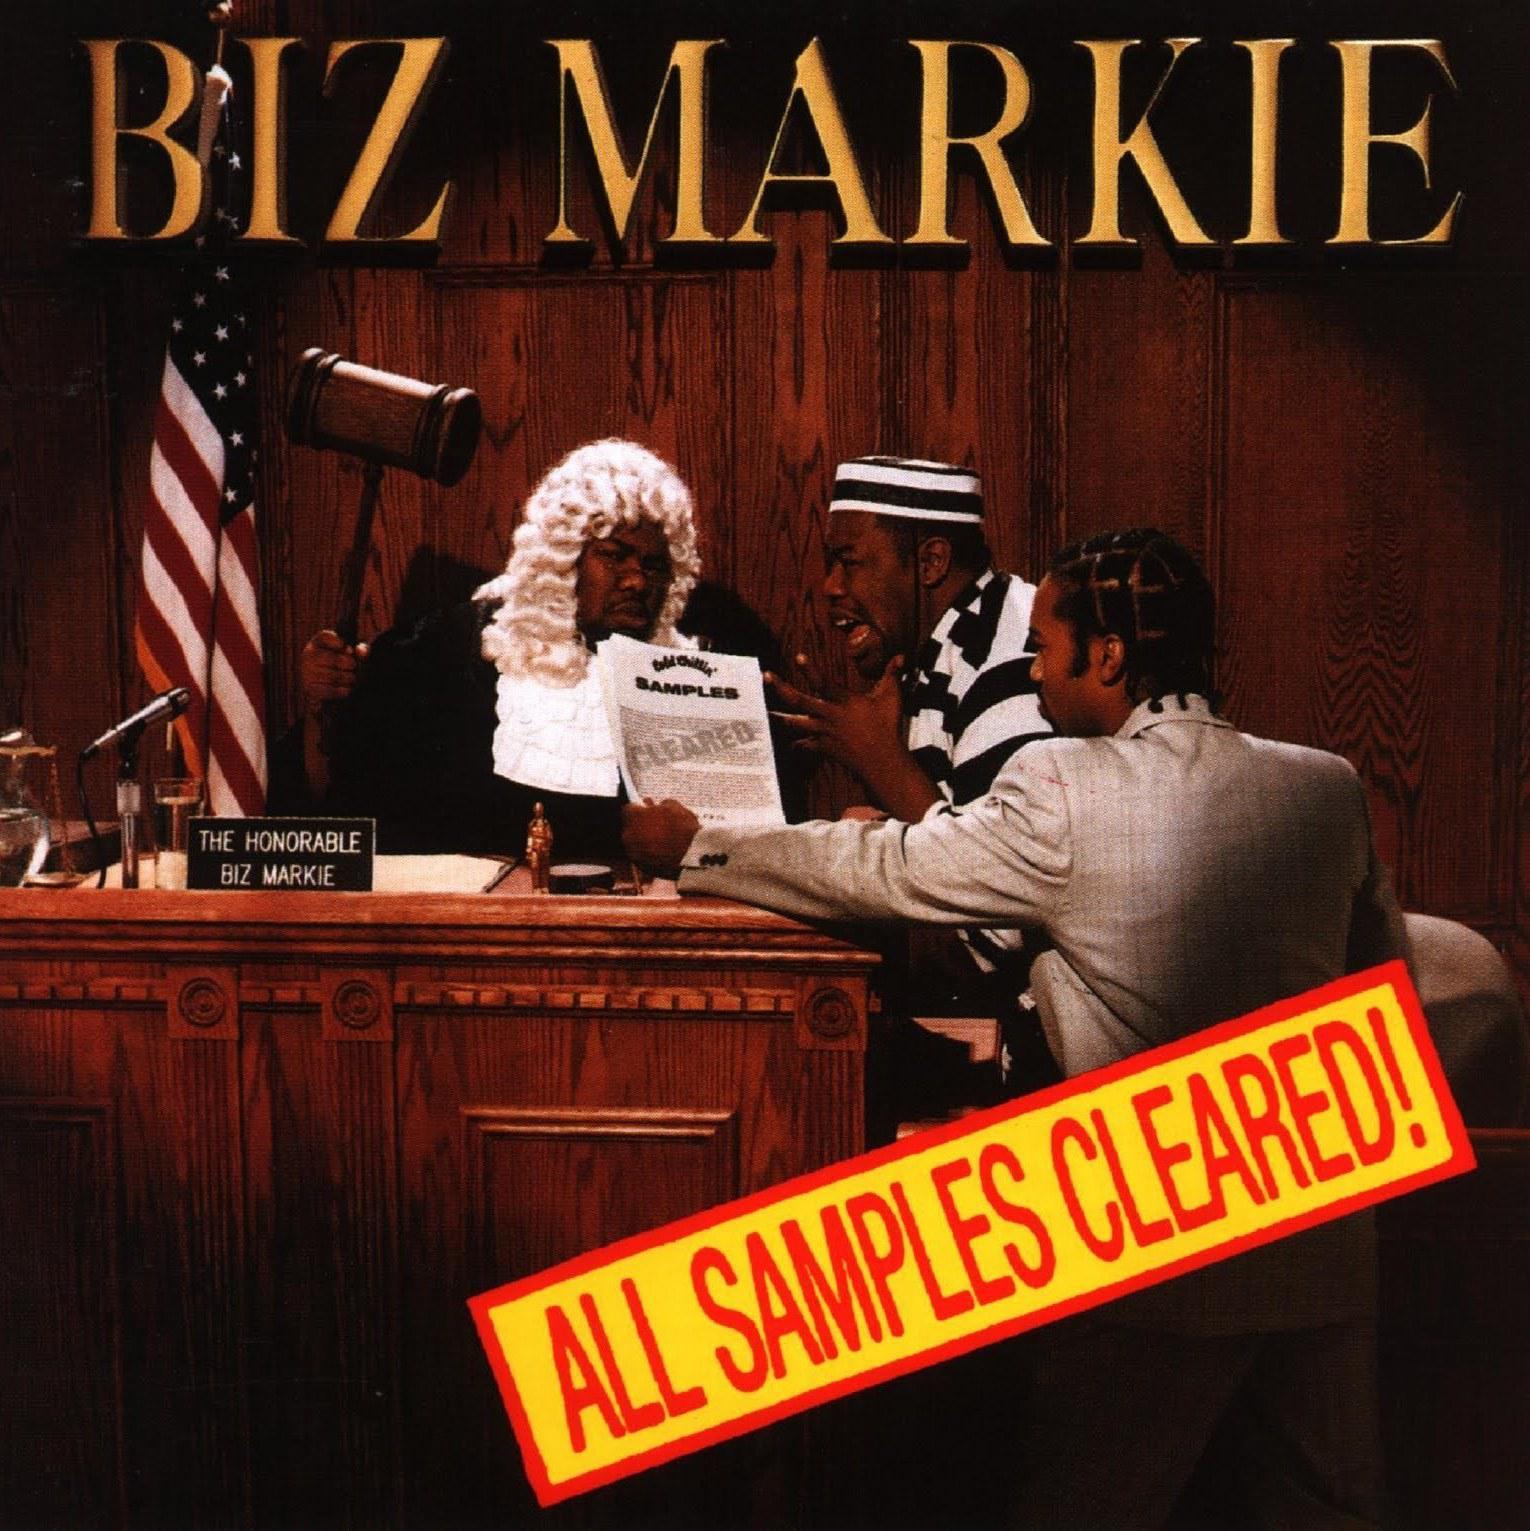 20 Years Ago Biz Markie Got The Last Laugh | WPRL